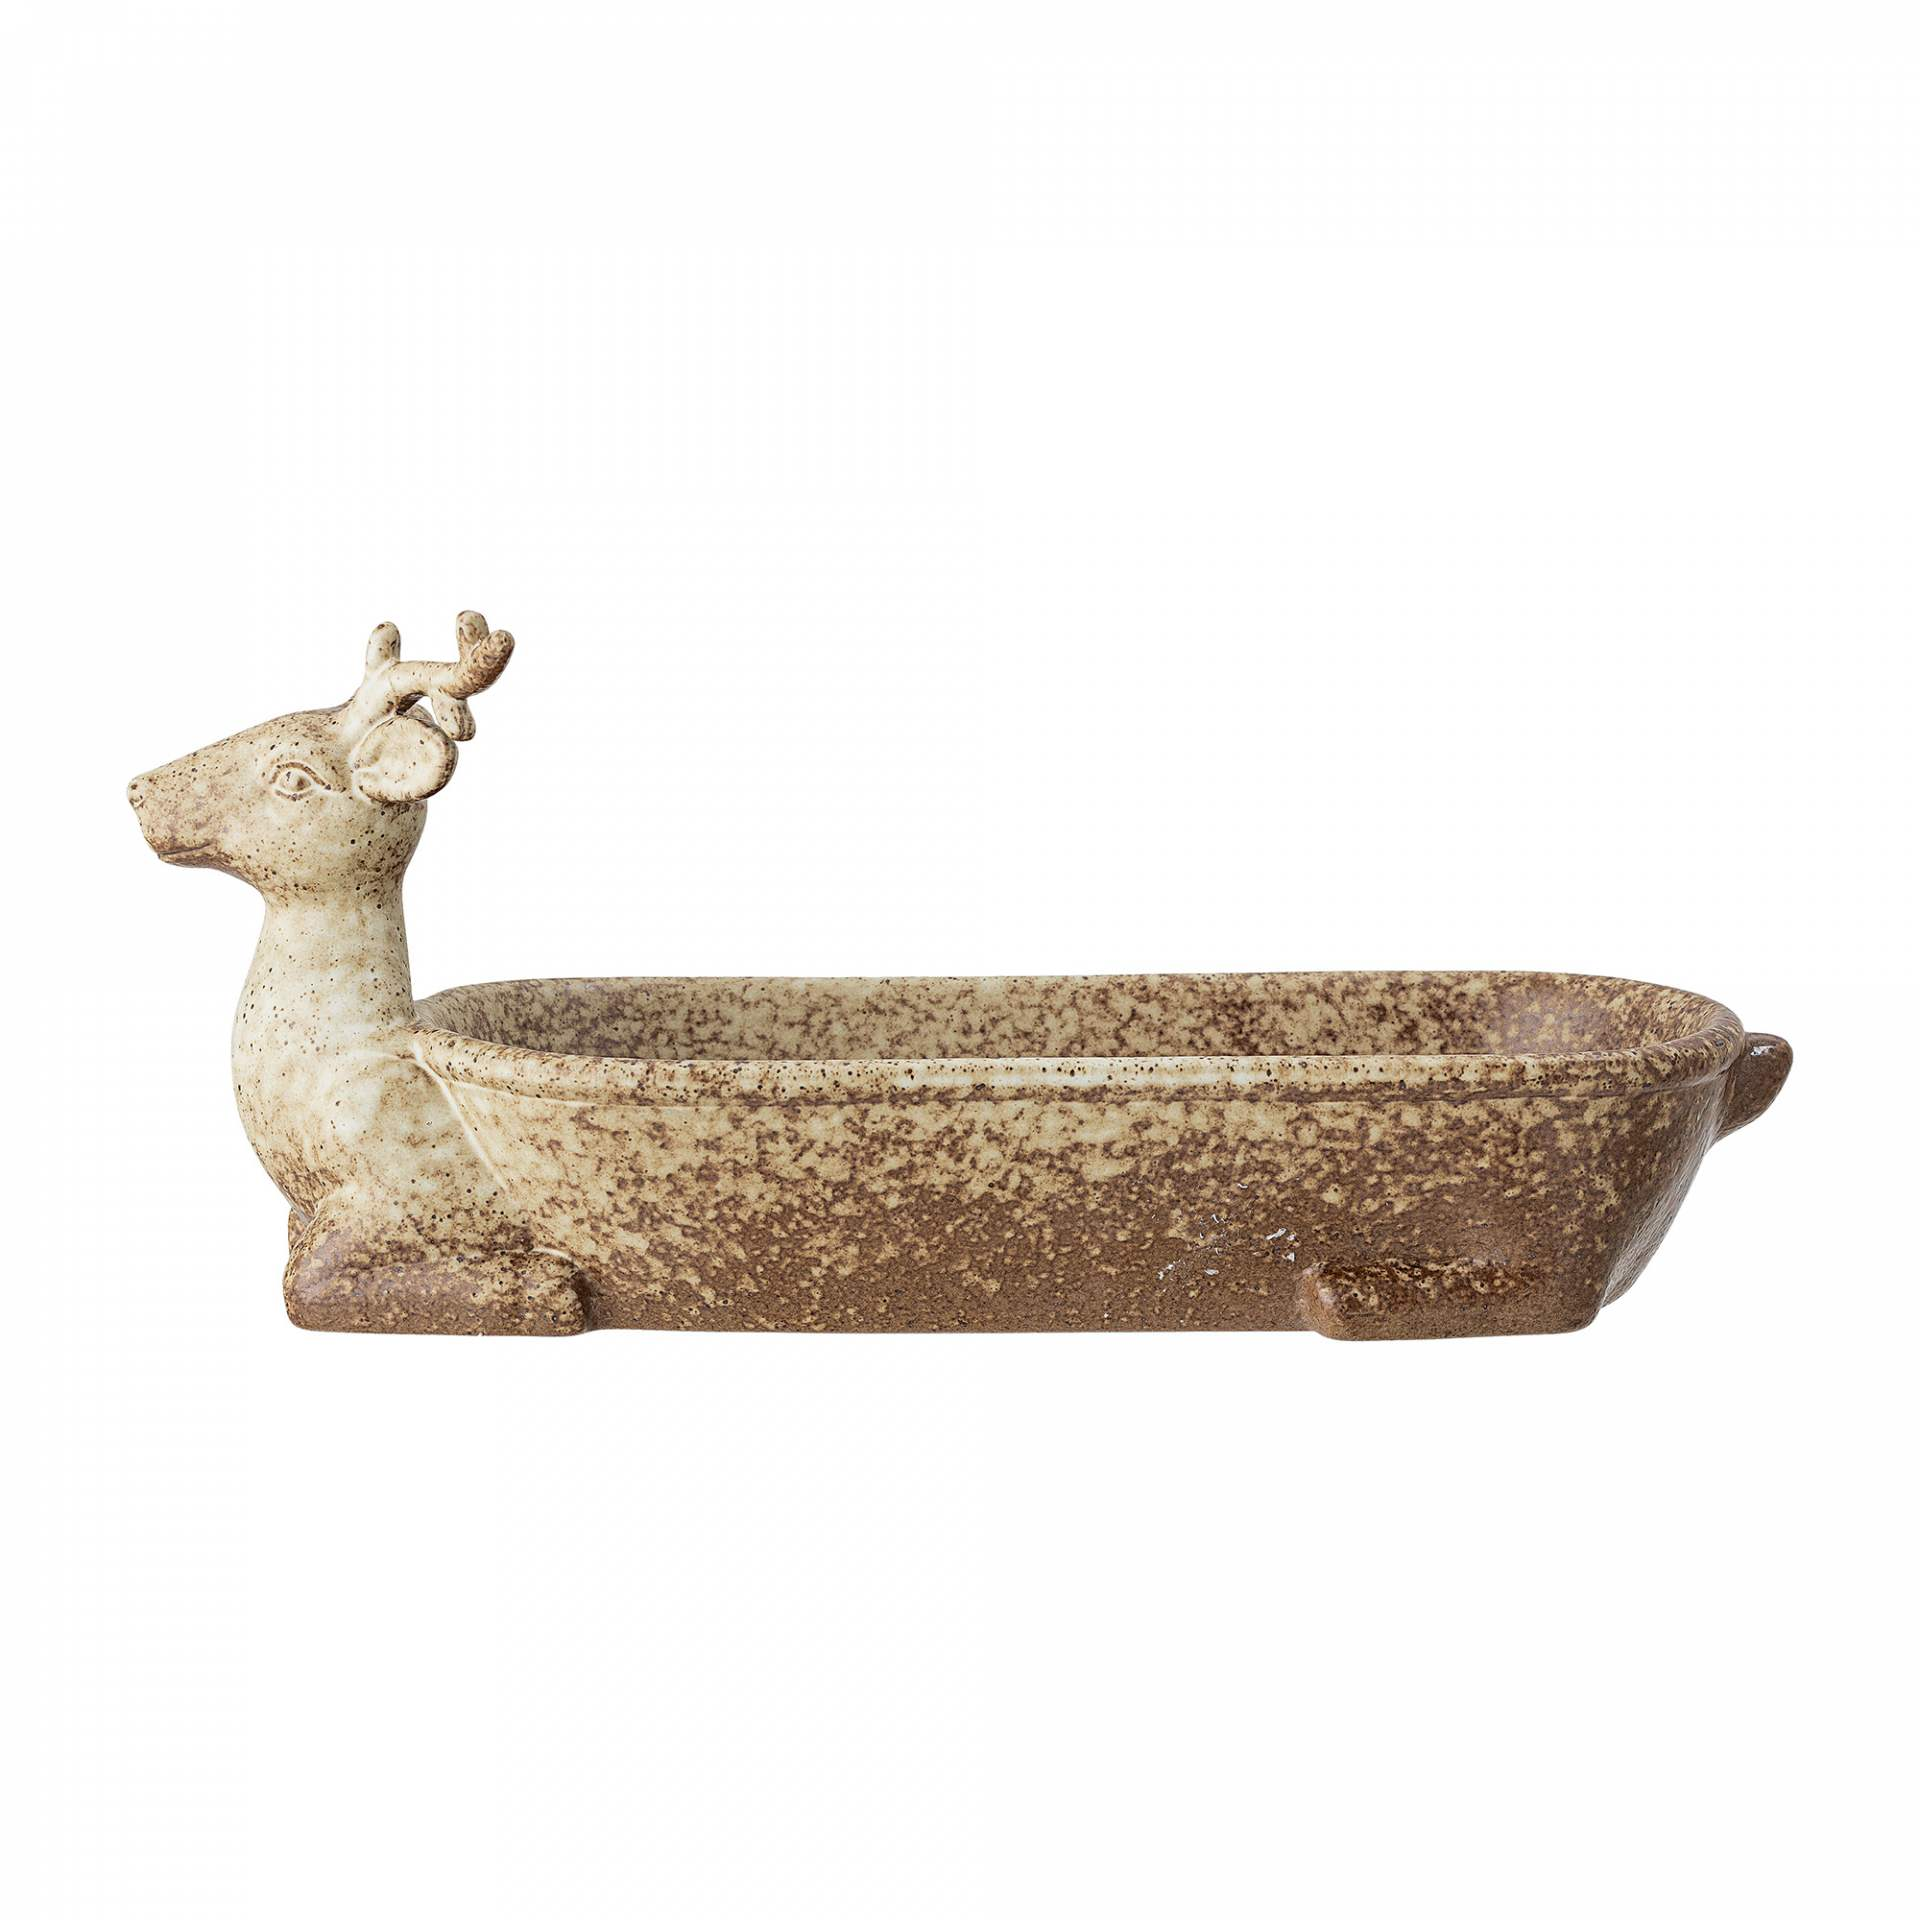 Bloomingville Podnos Atria Stoneware, přírodní barva, keramika